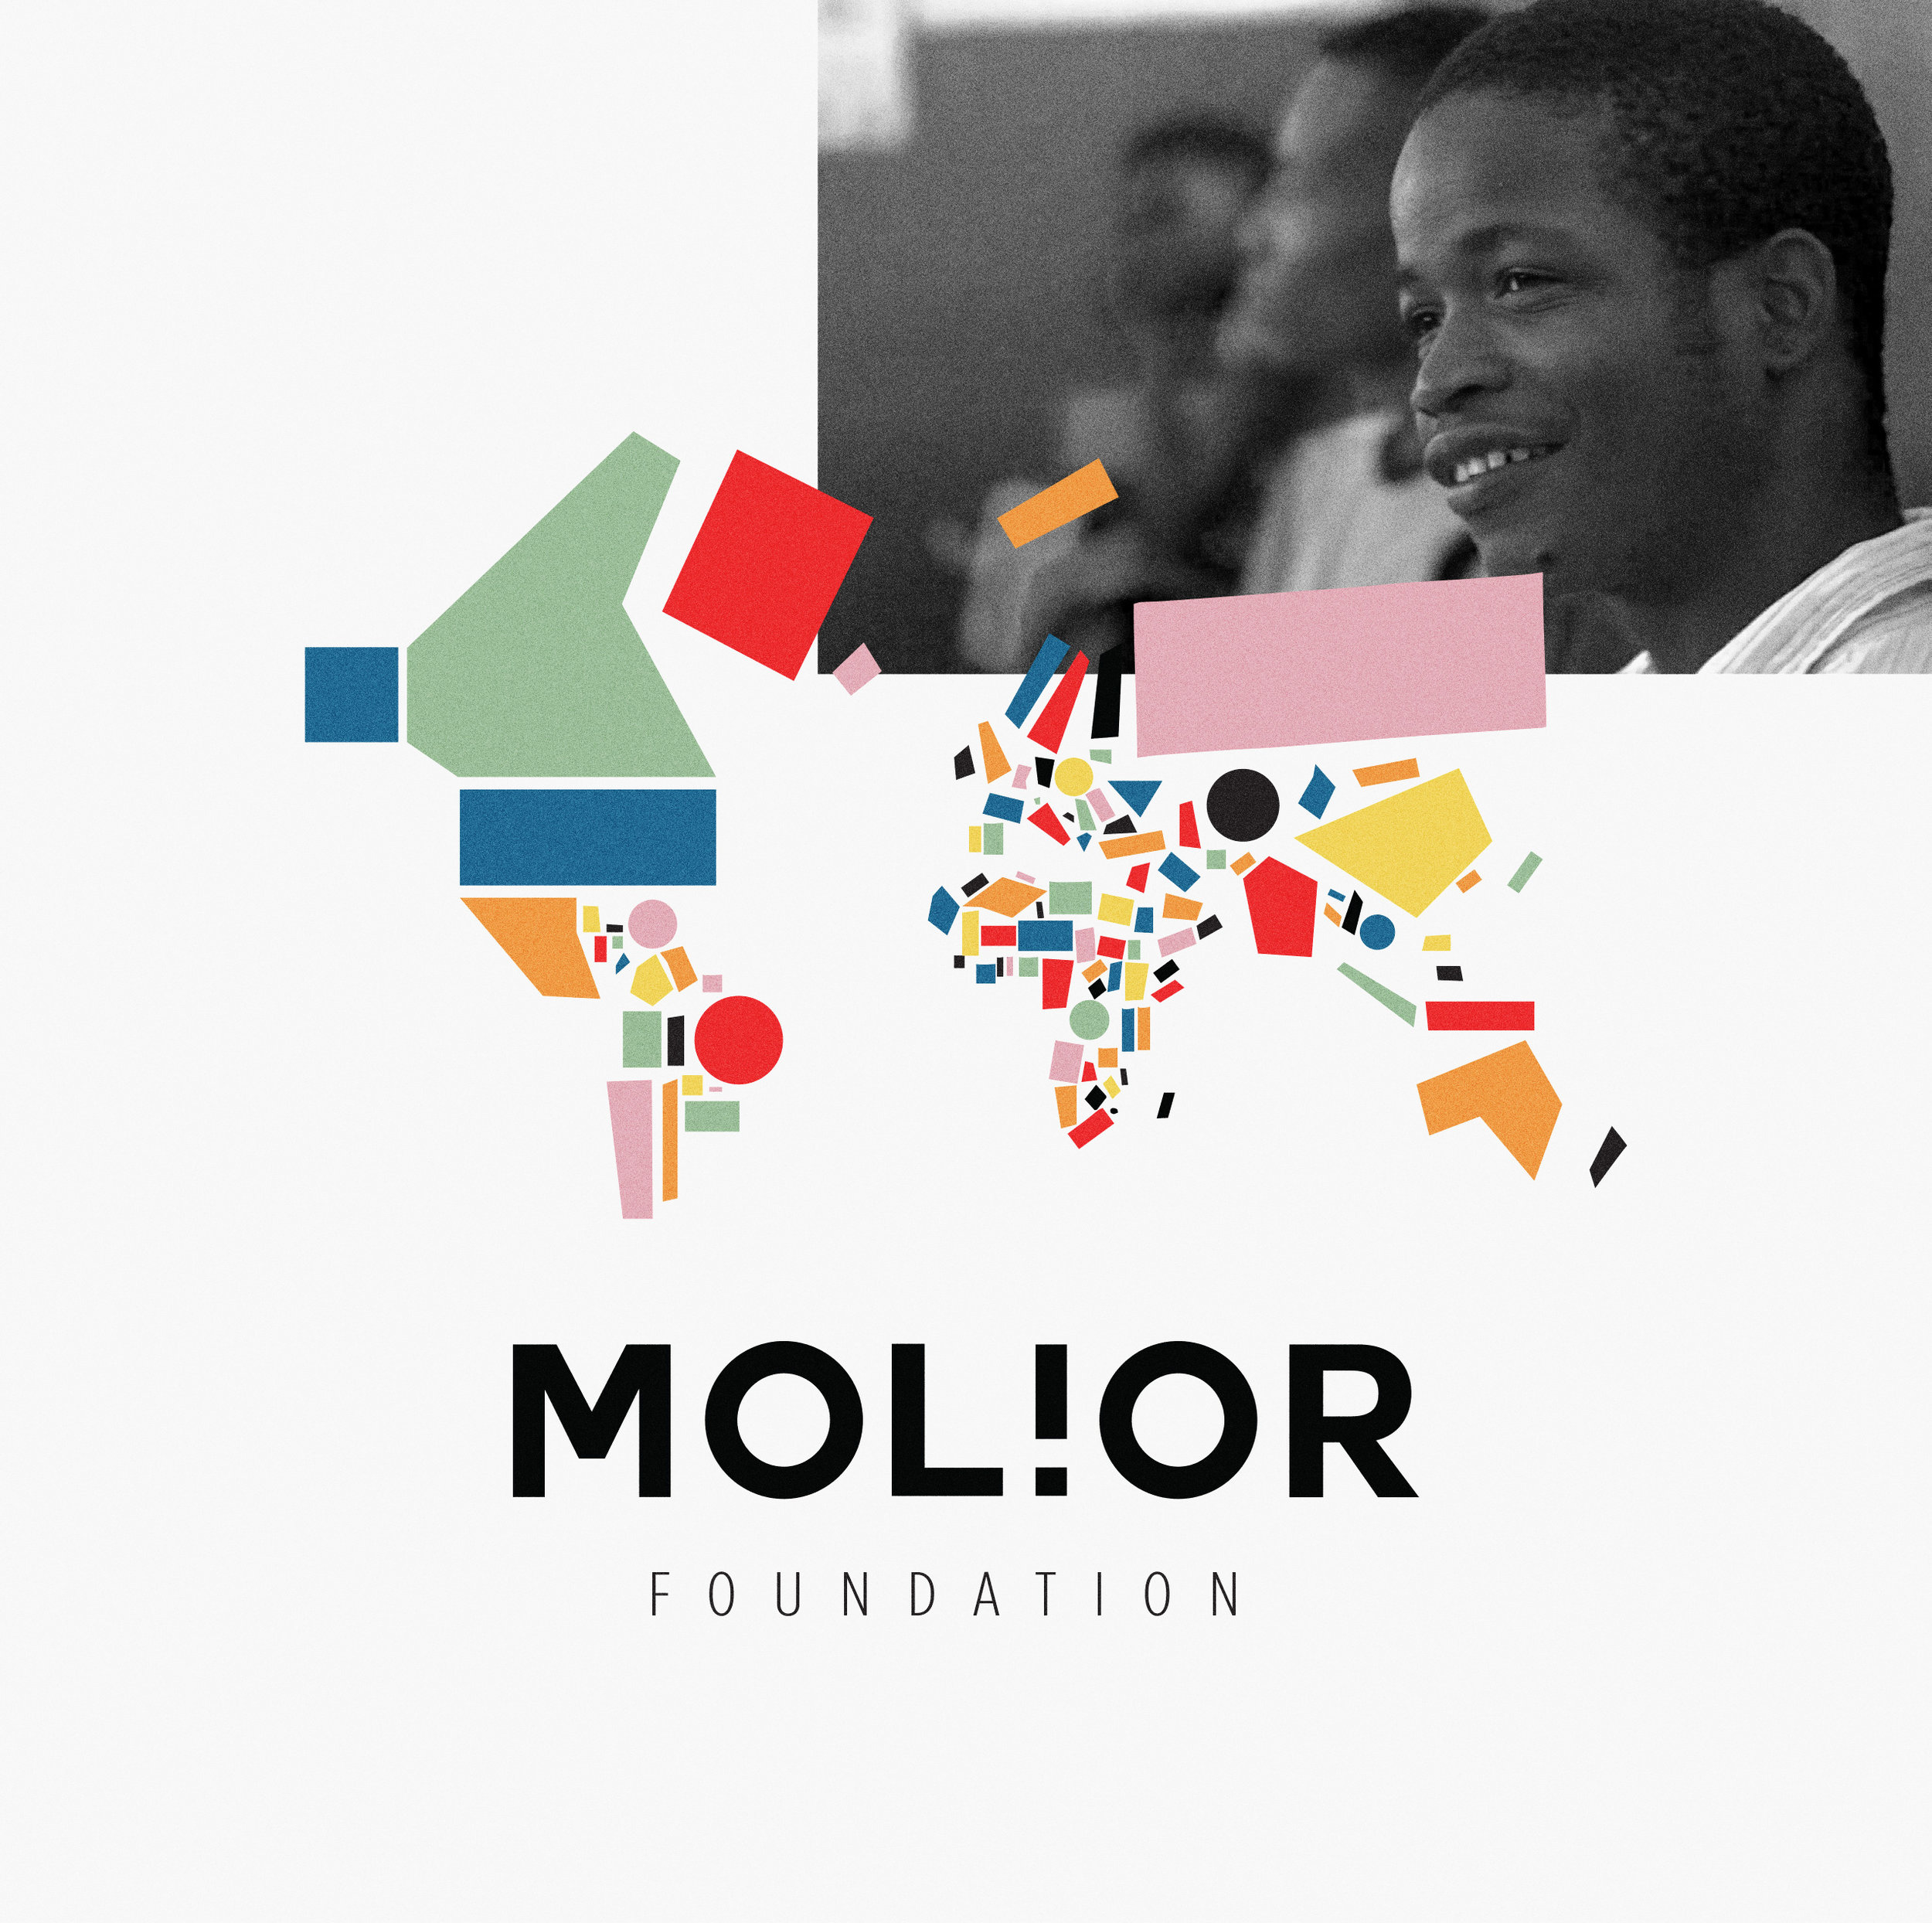 MOLIOR_Non_Profit_Design-RyanStrong.jpg